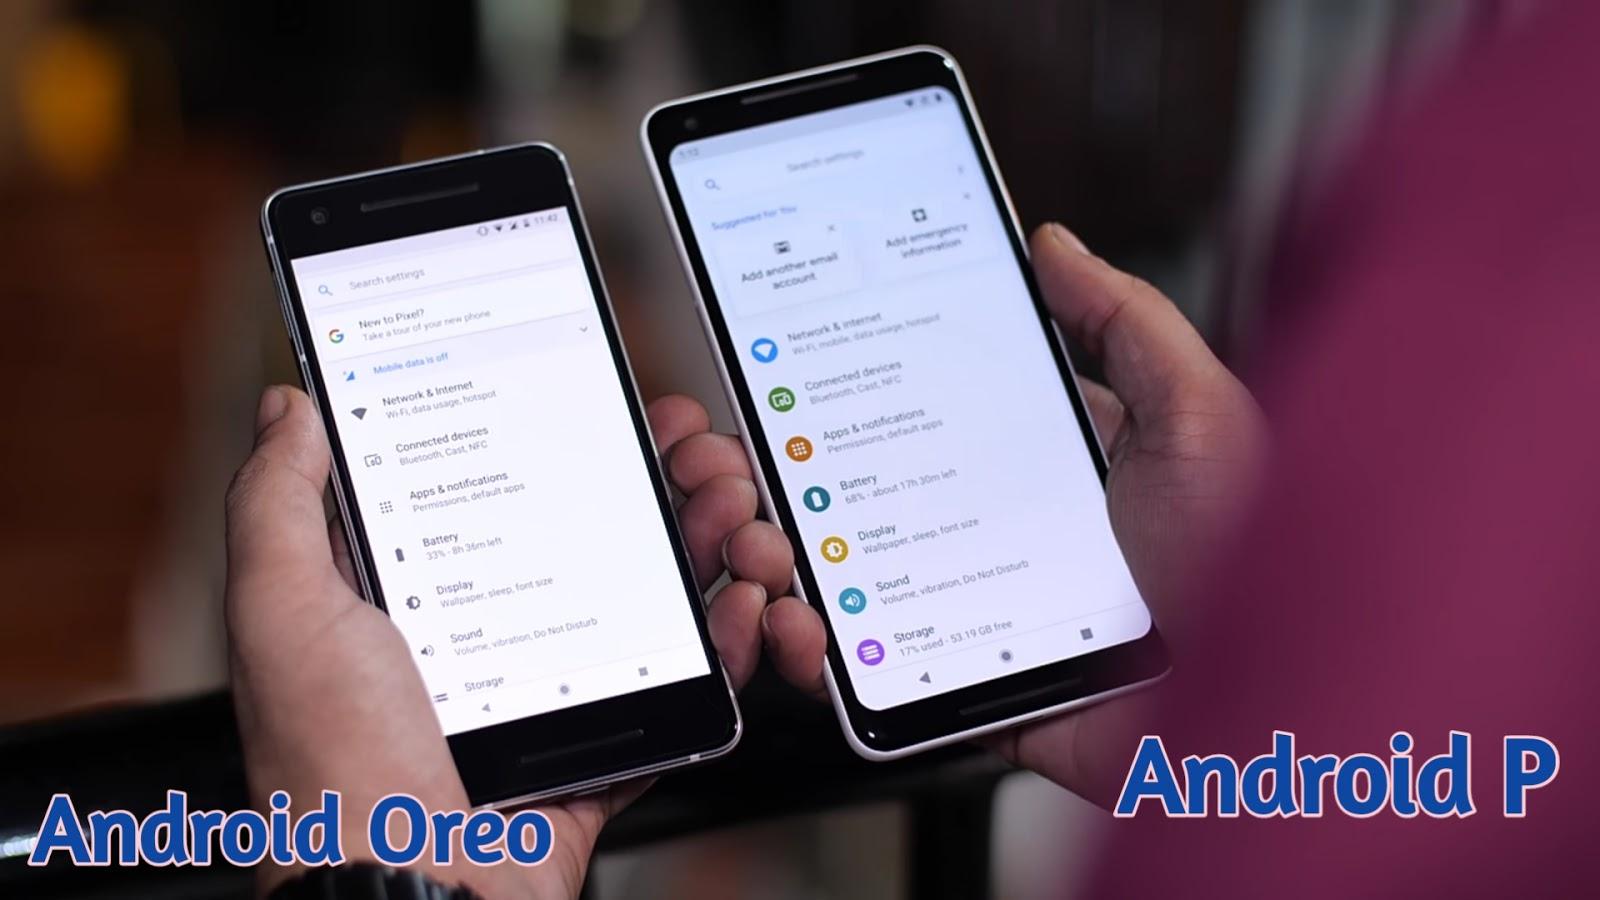 Android P's colored settings menu vs android oreo's blank settings menu